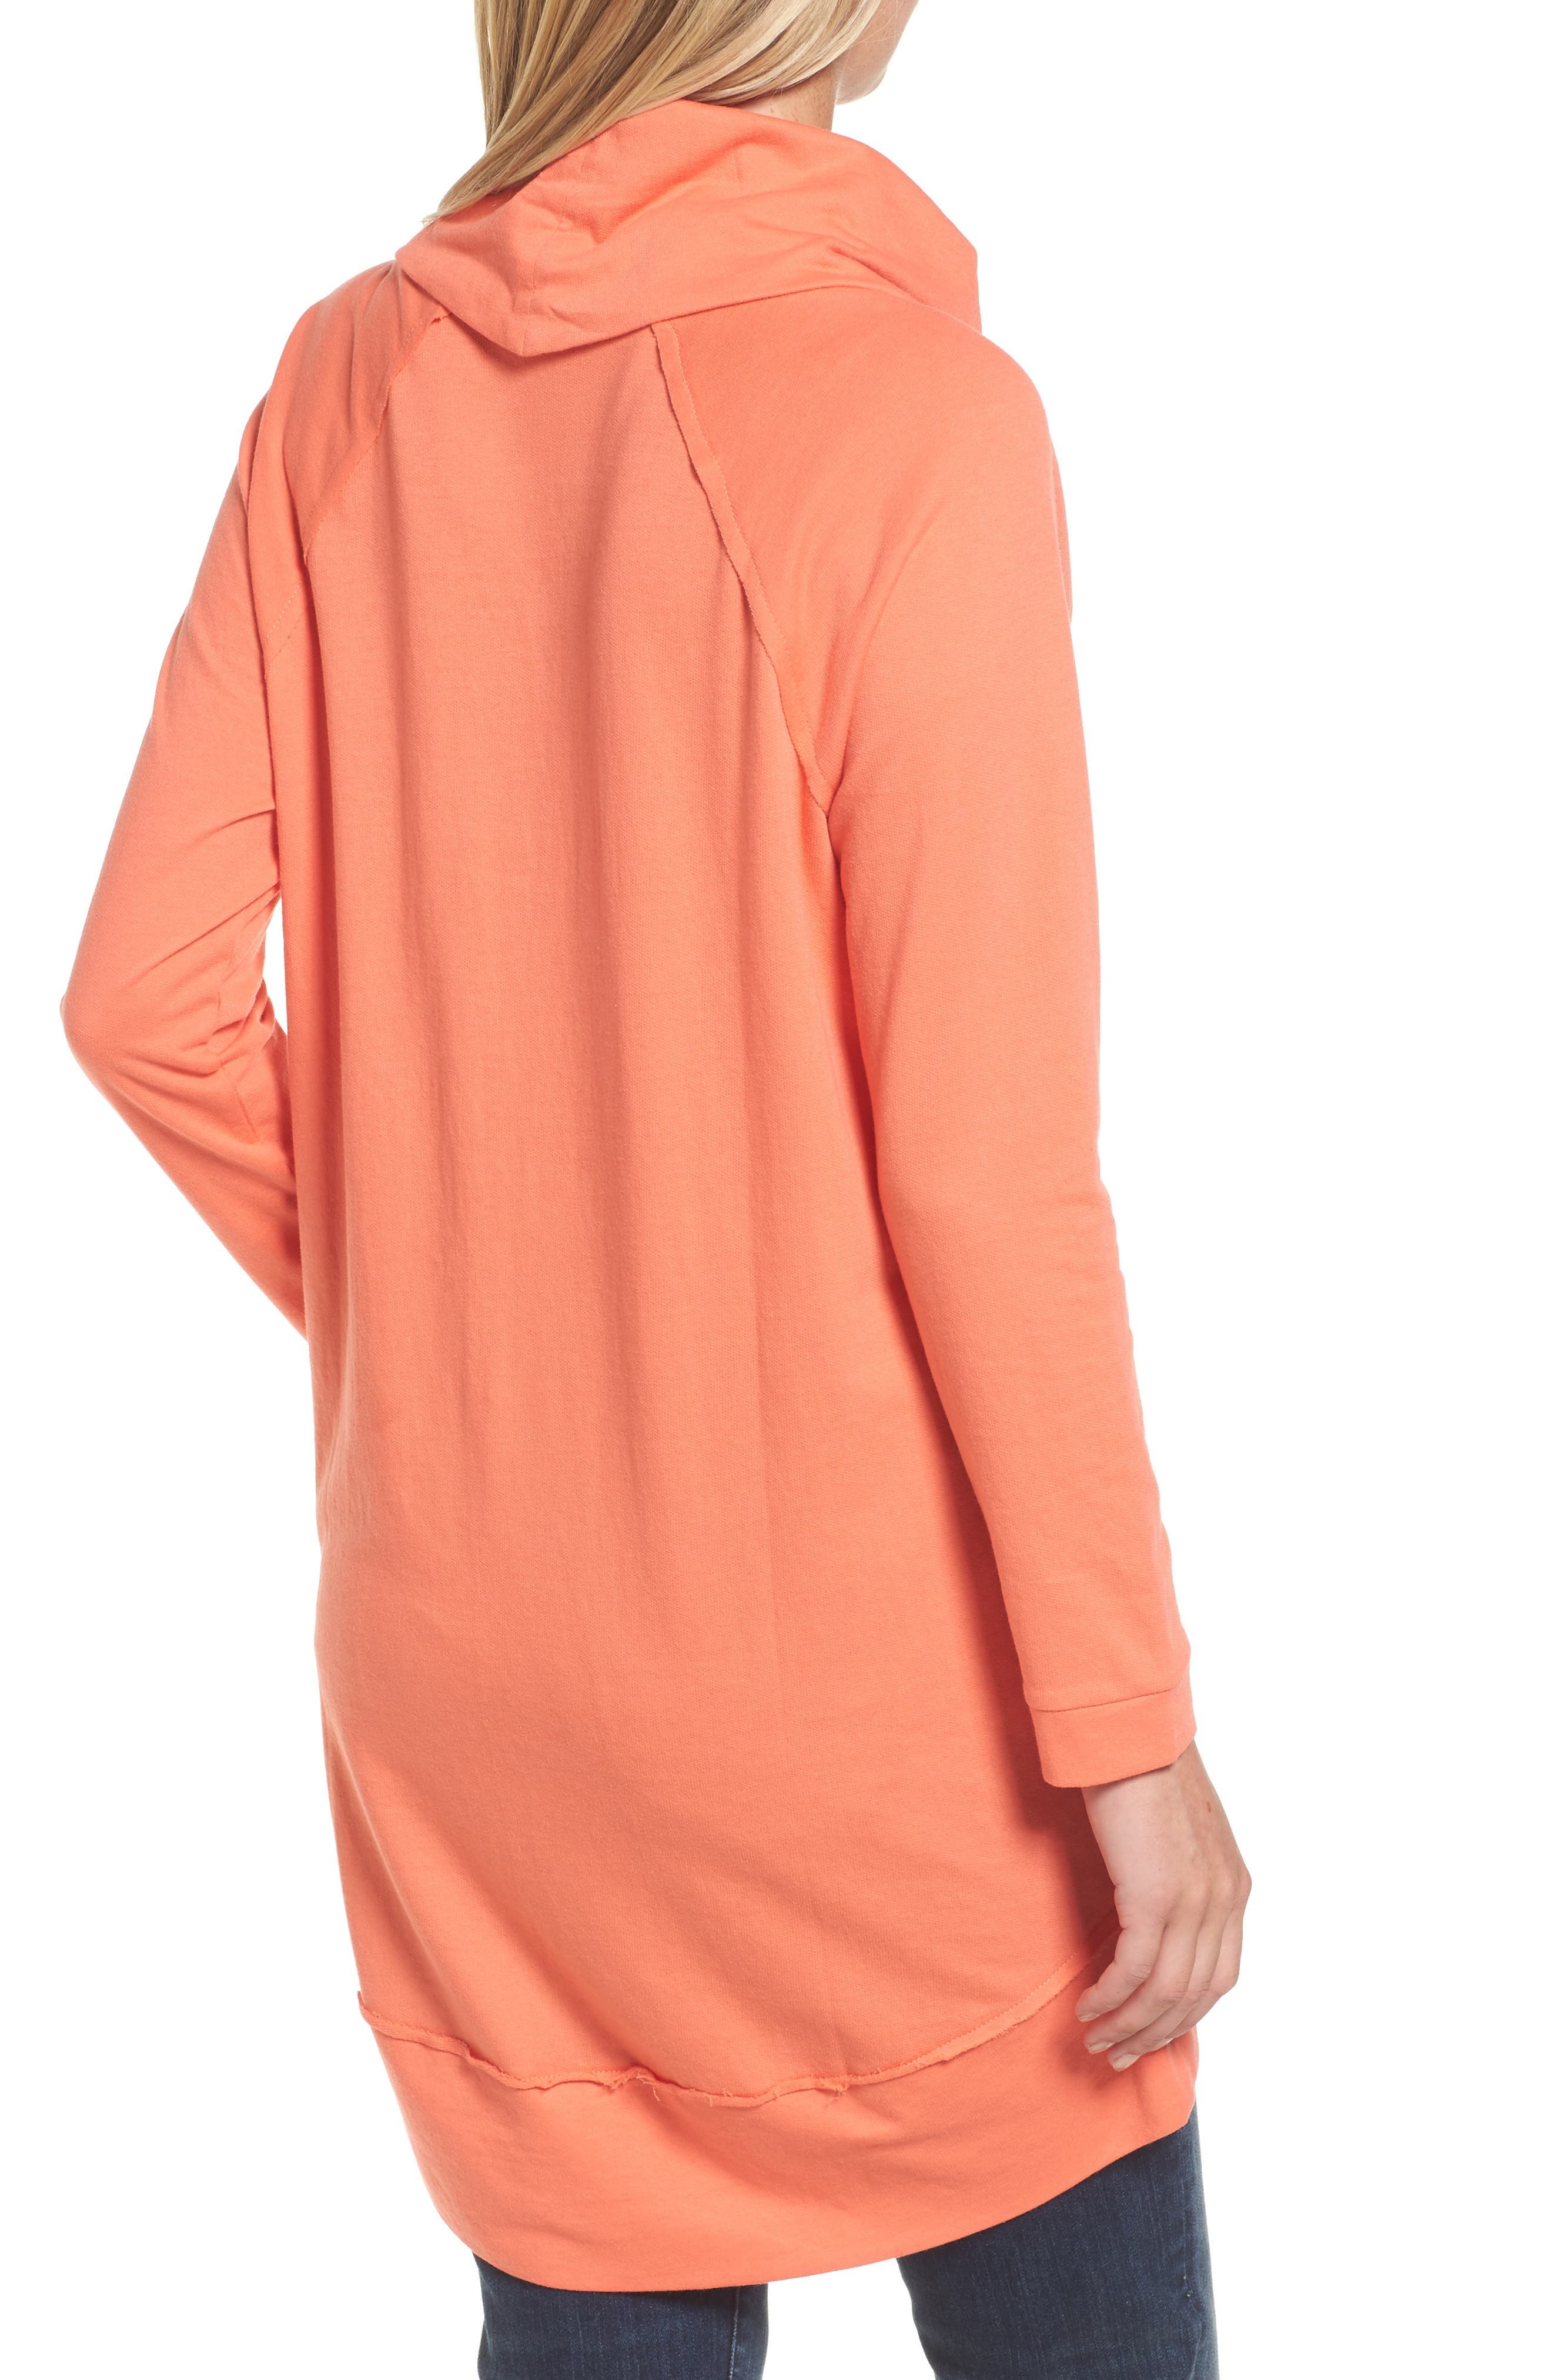 Cowl Neck Tunic Sweatshirt,                             Alternate thumbnail 2, color,                             Coral Sea